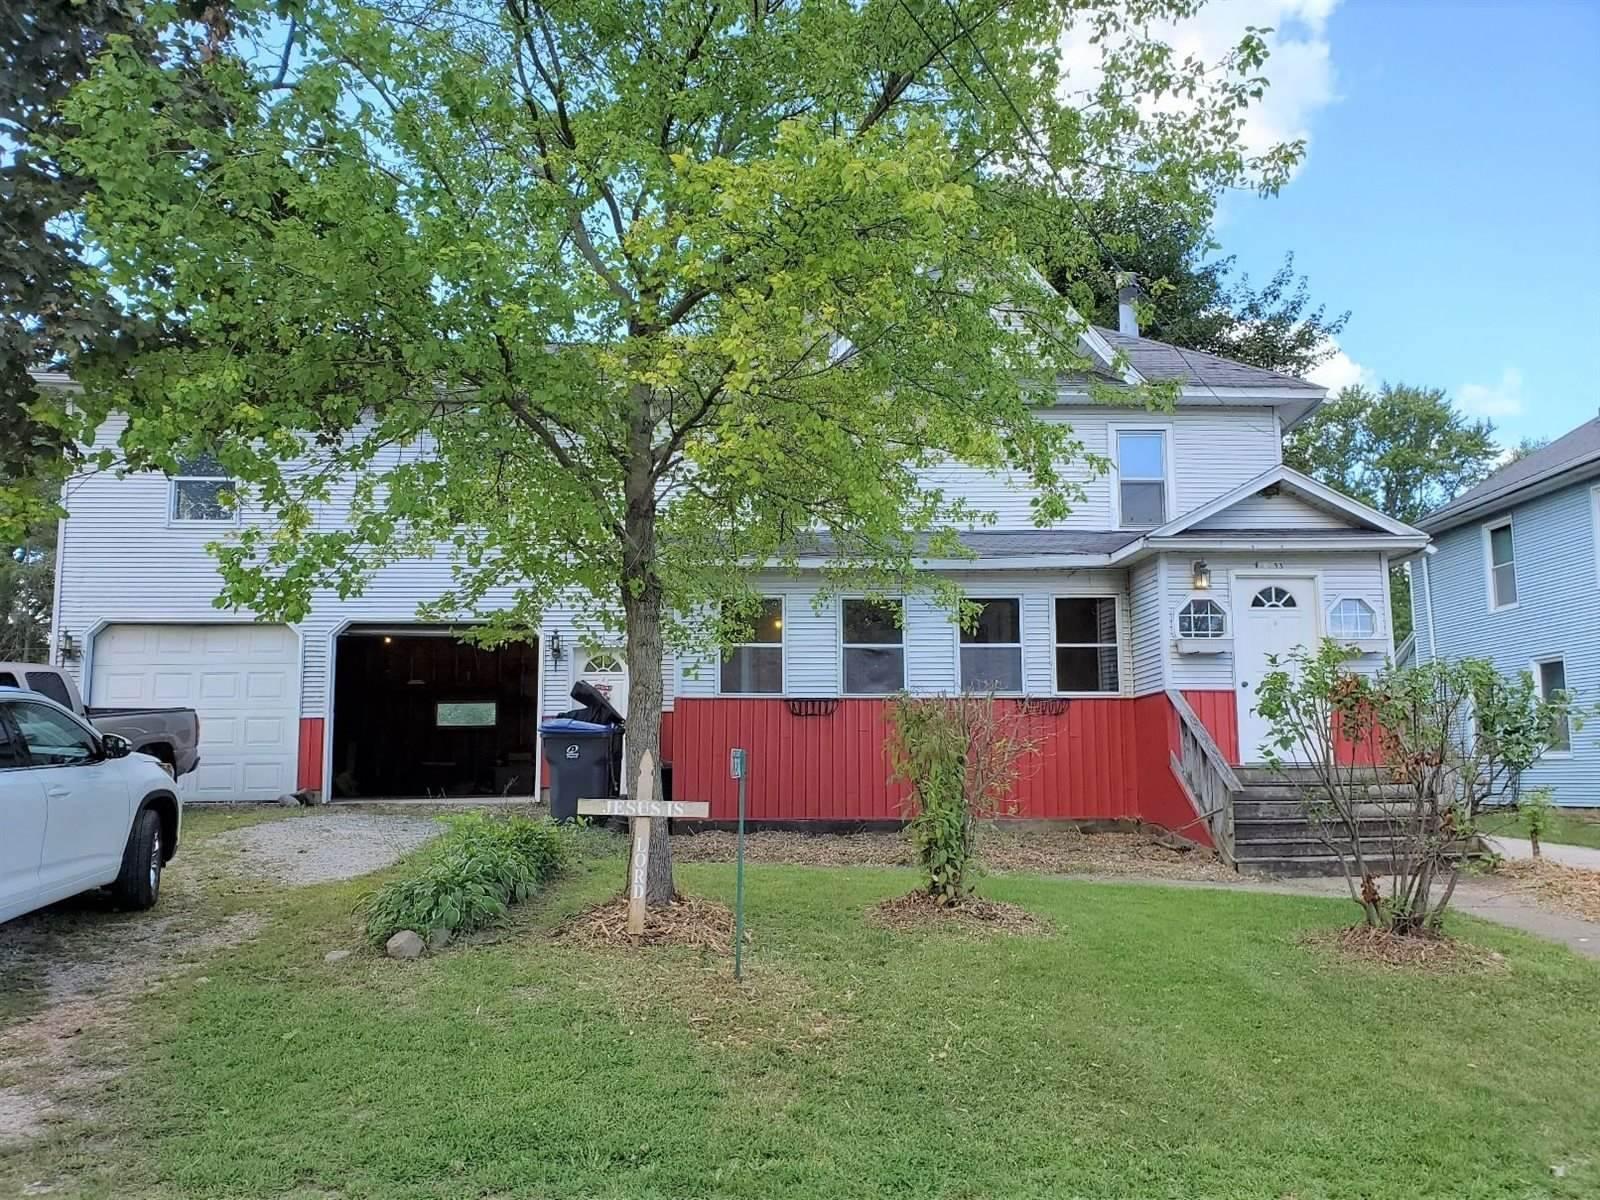 W3833 Jefferson St, Sullivan, WI 53178